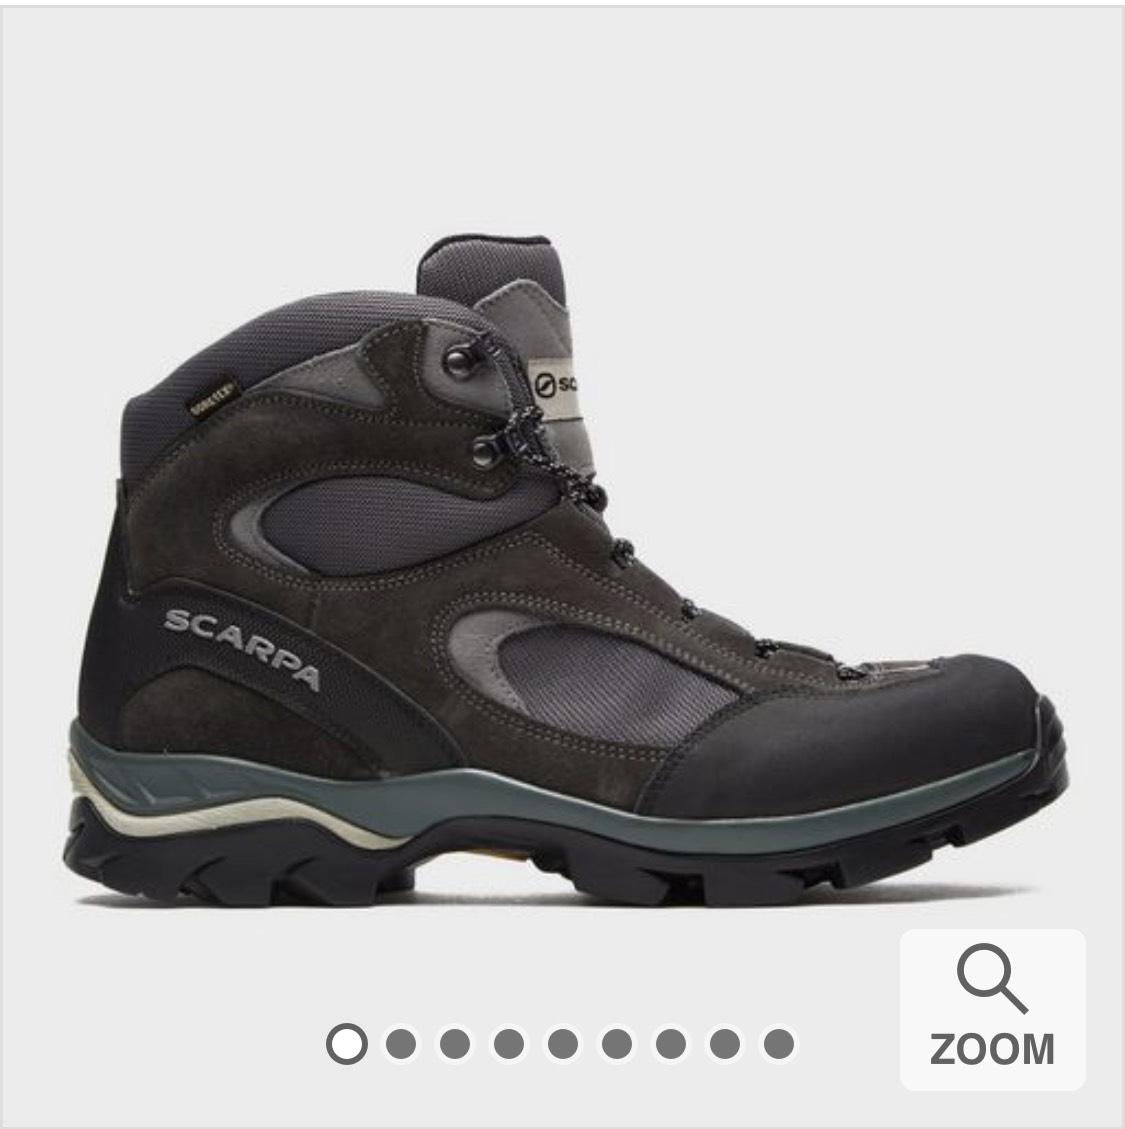 Scarpa zg65 Gore-Tex Boots £39.50 @ Blacks